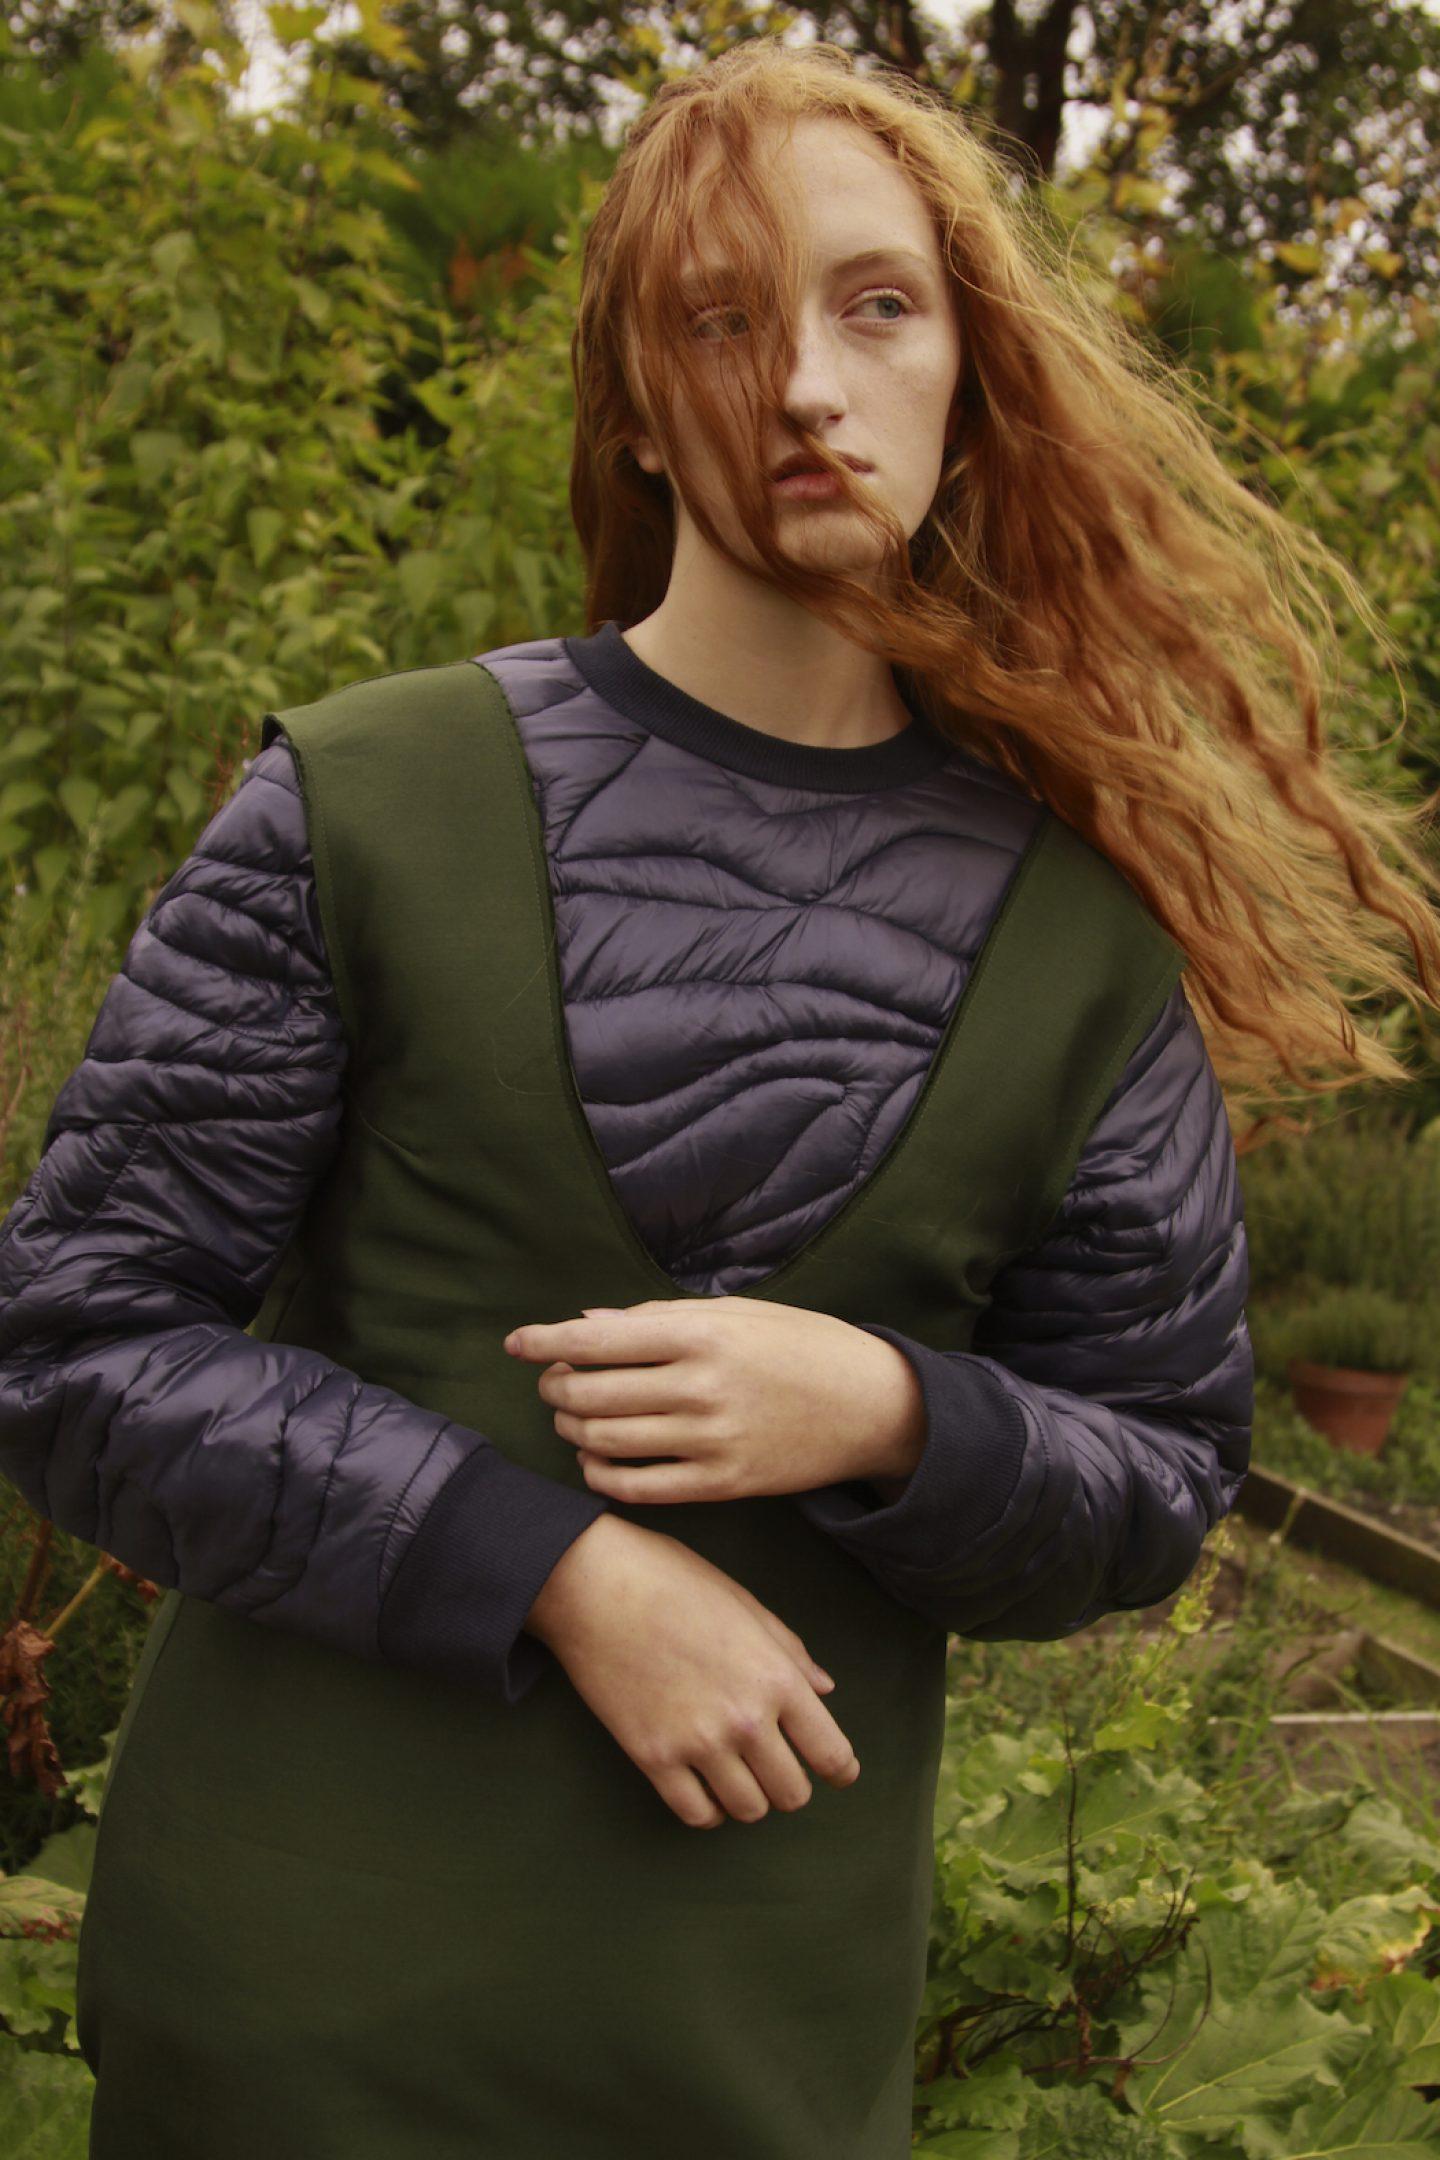 neverland_fashion_010